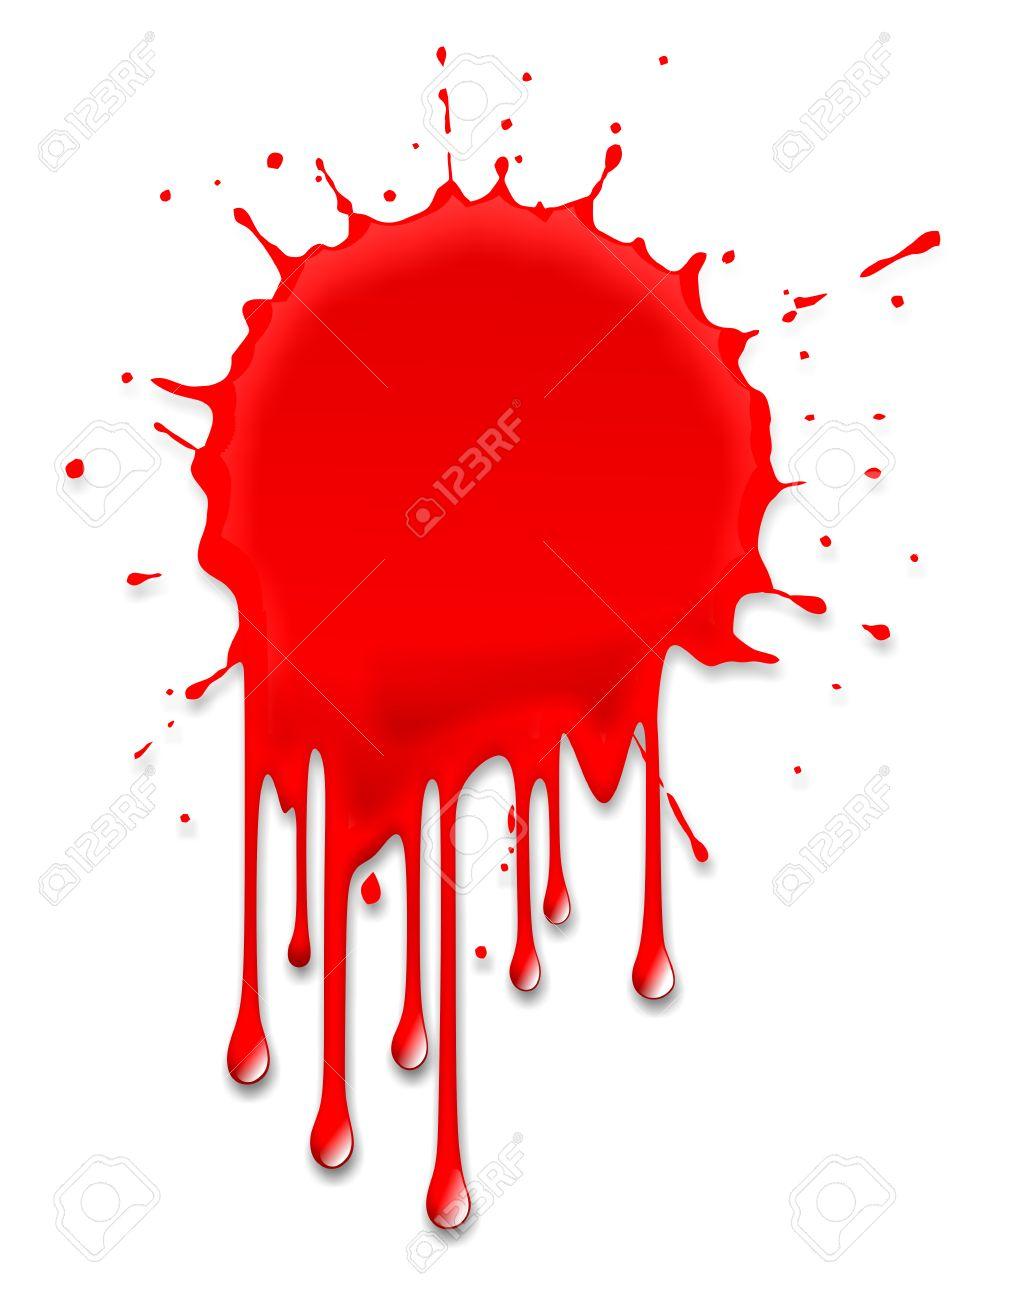 illustration of a blood splash on halloween stock illustration 23416590 - Blood For Halloween